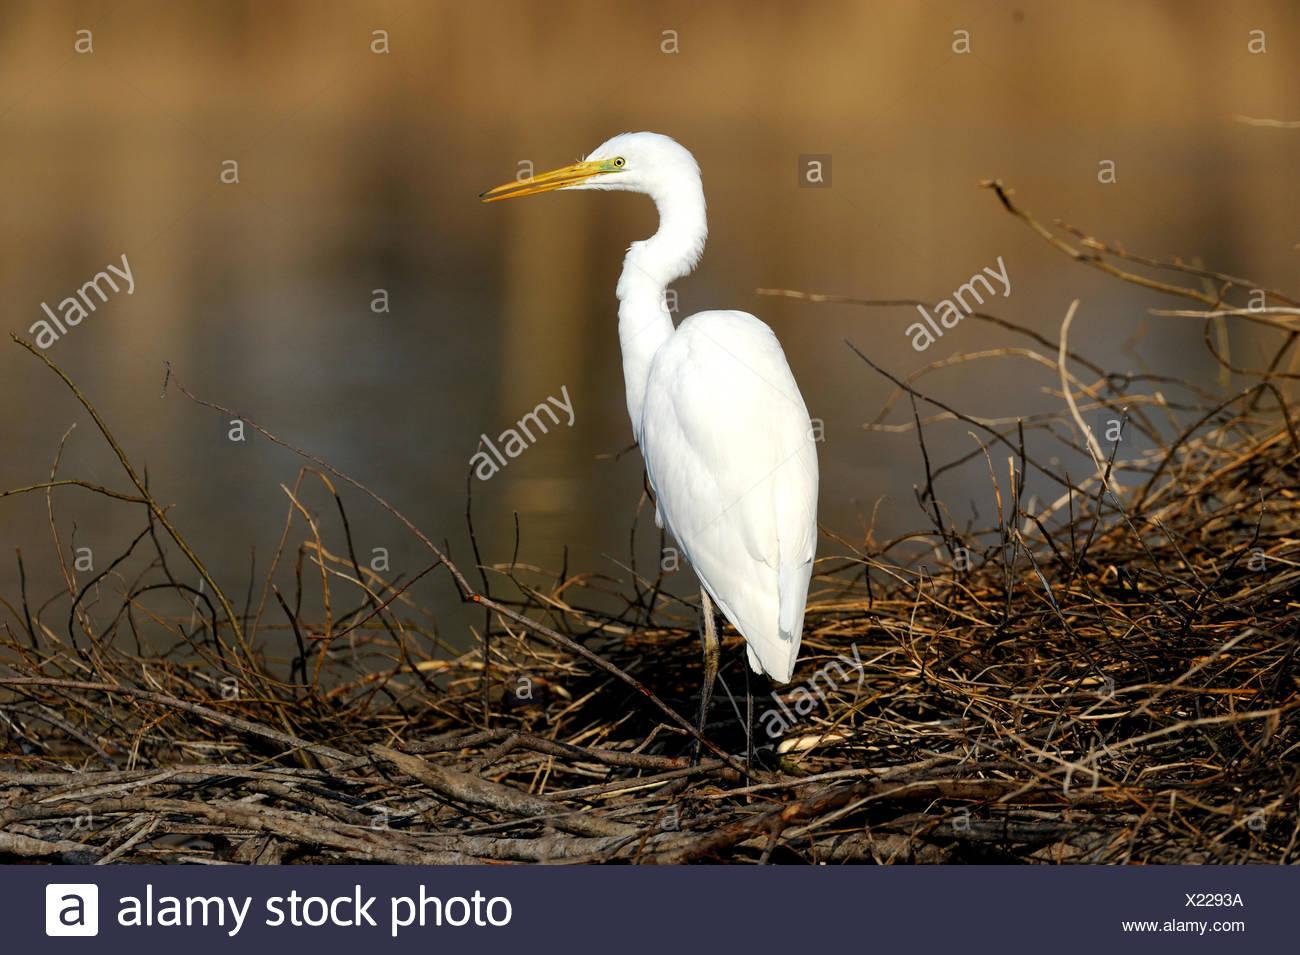 Egret Casmerodius albus heron ciconiiformes birds water birds egrets late winter beaver lodge Altmuehl lake Franconia animal a - Stock Image